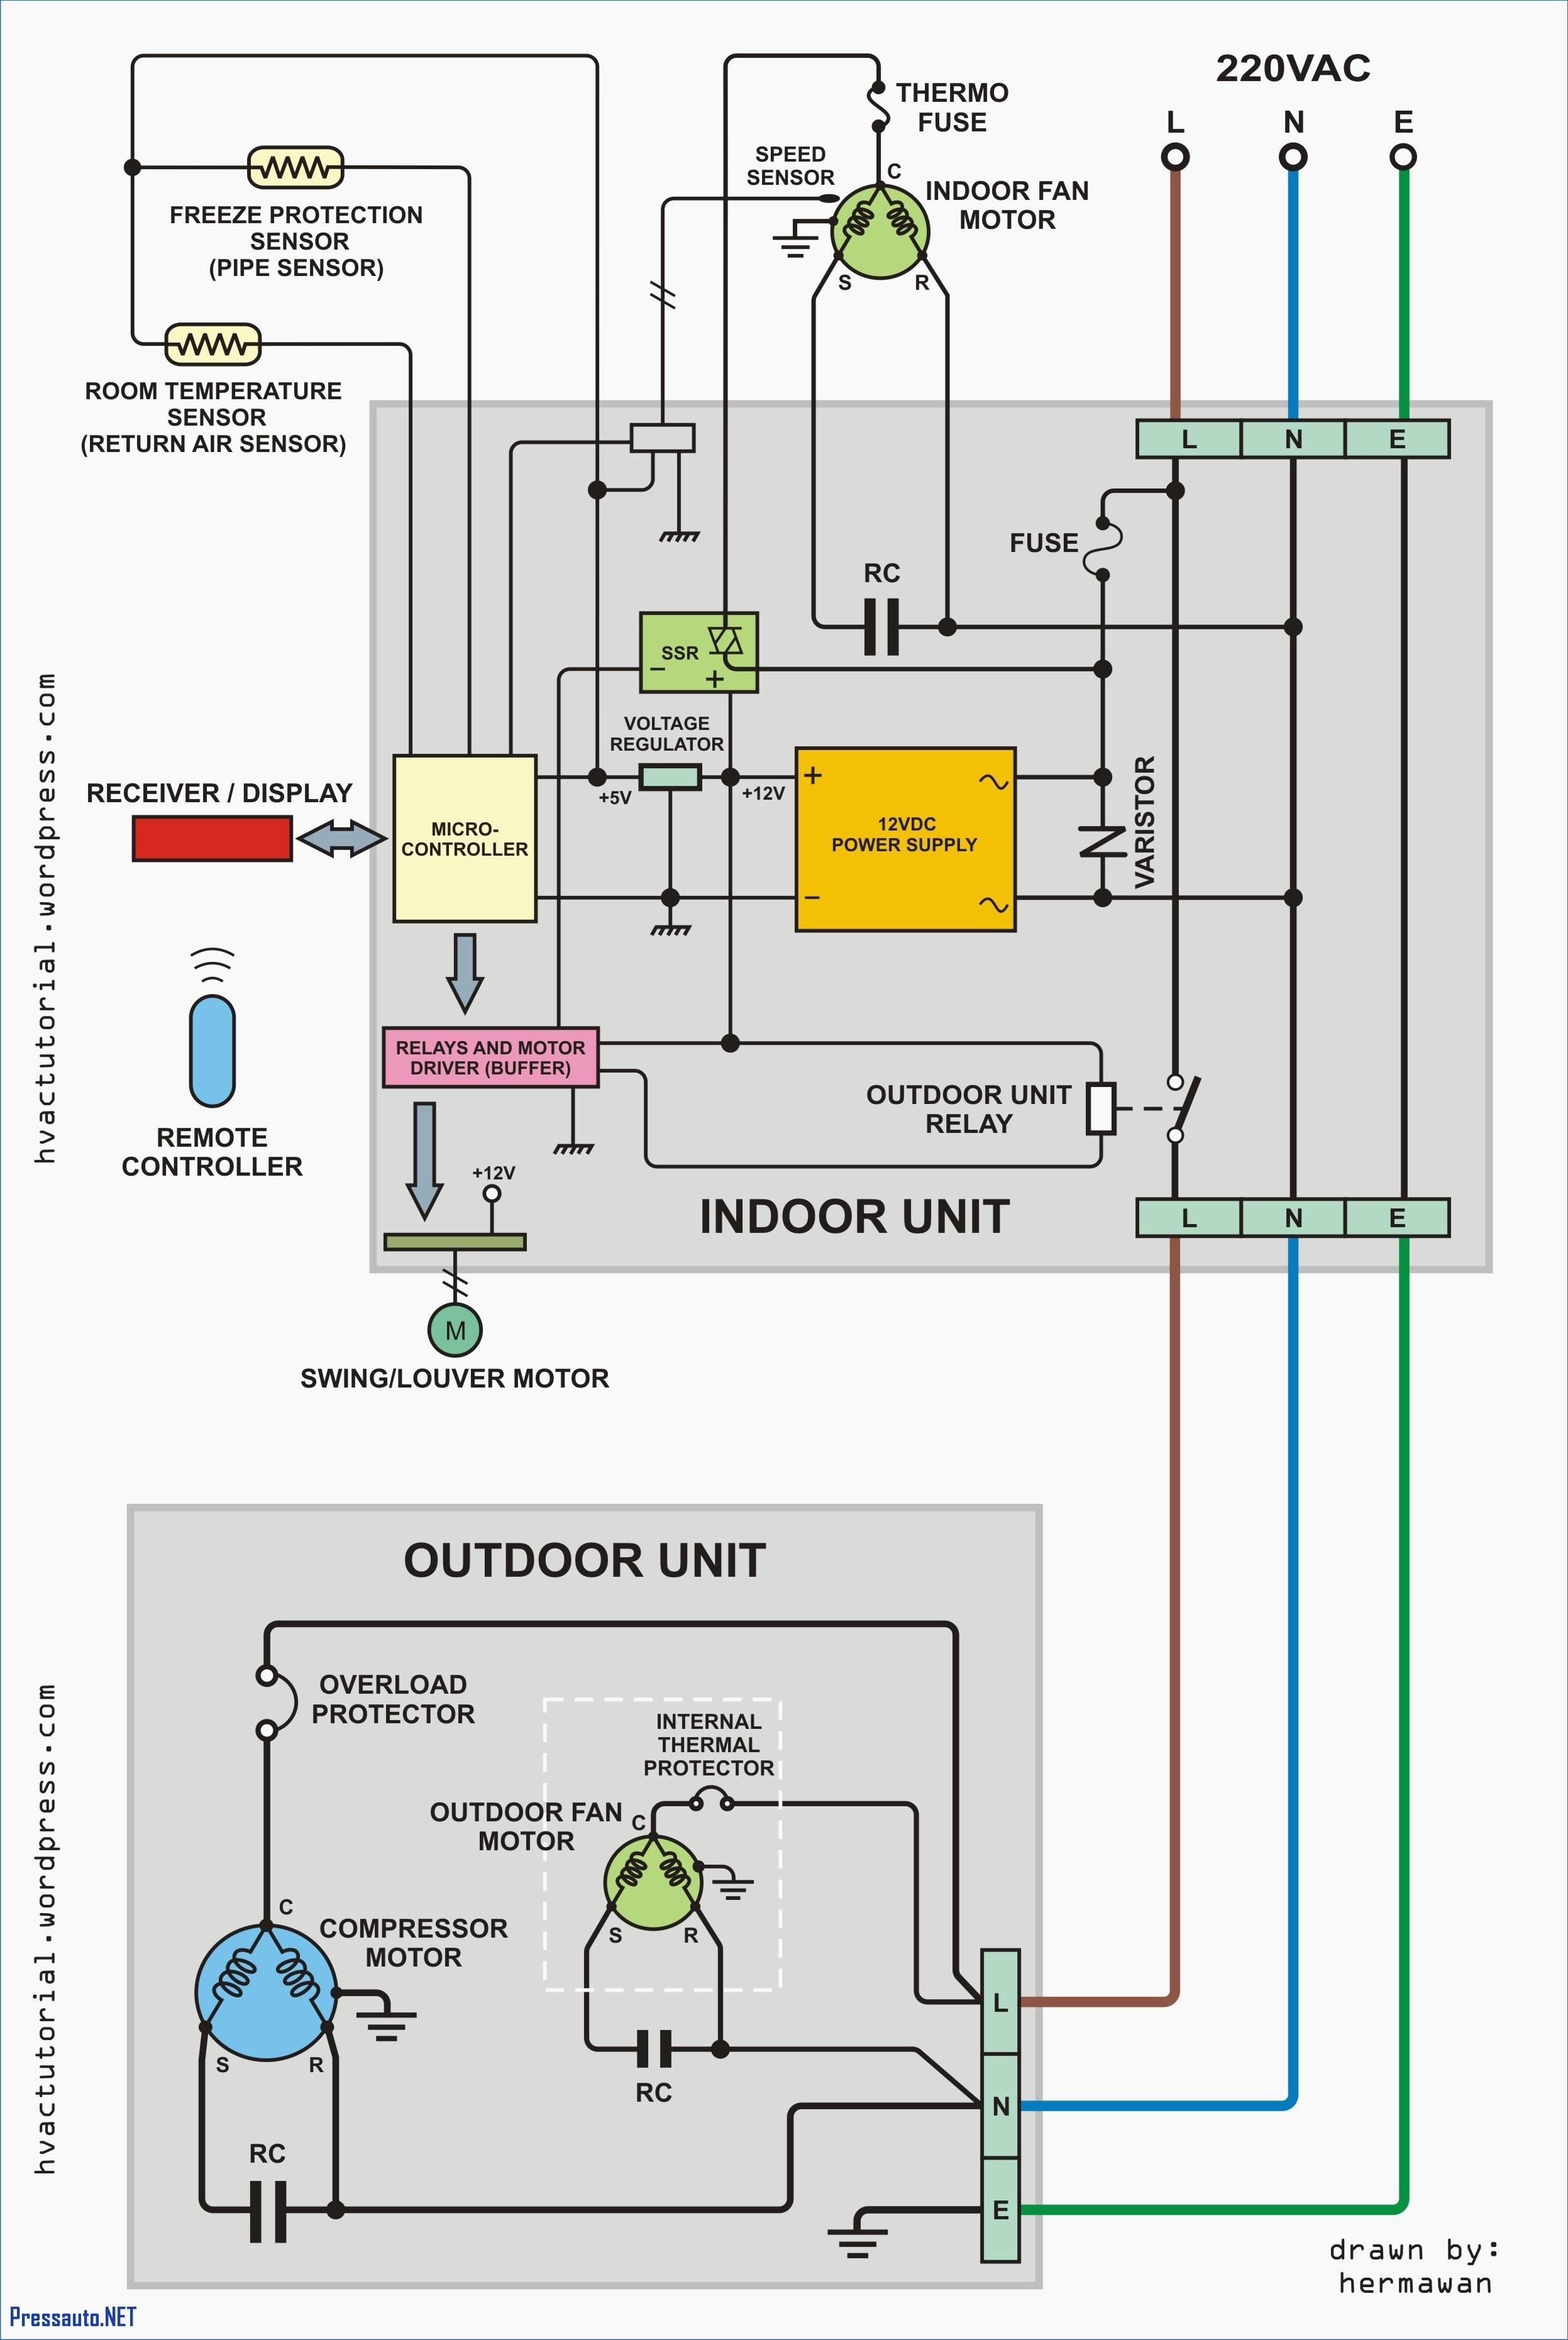 Trane thermostat Wiring Diagram New Honeywell Heat Pump thermostat Wiring Diagram Trane Tud120r 2 and